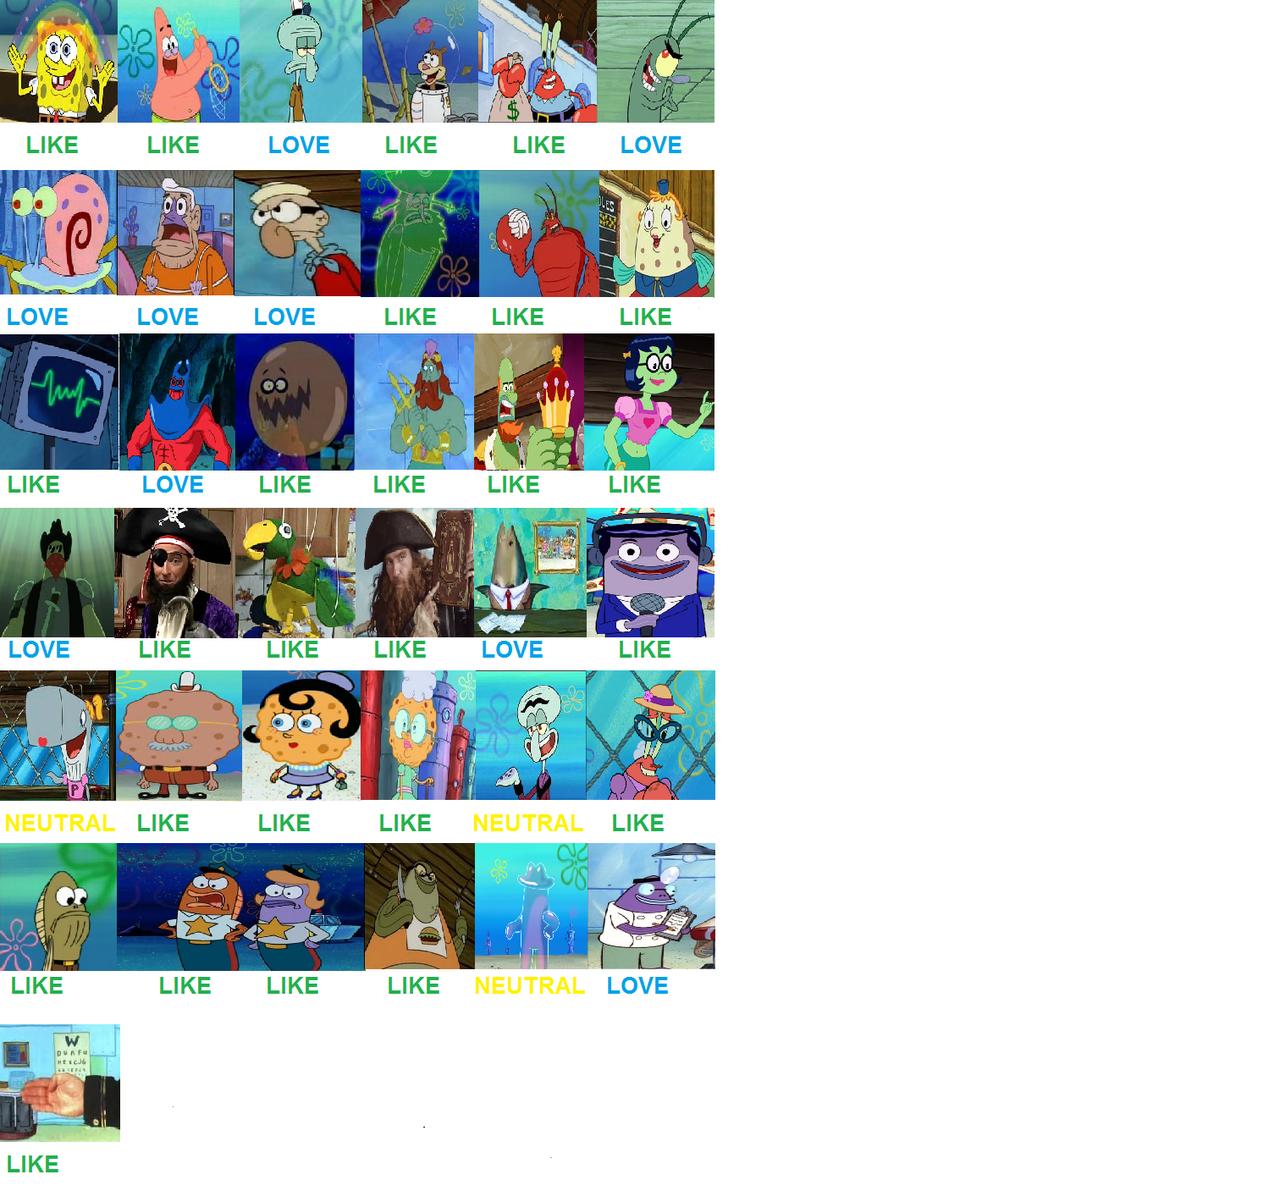 spongebob character scorecard by thegreatserver on deviantart